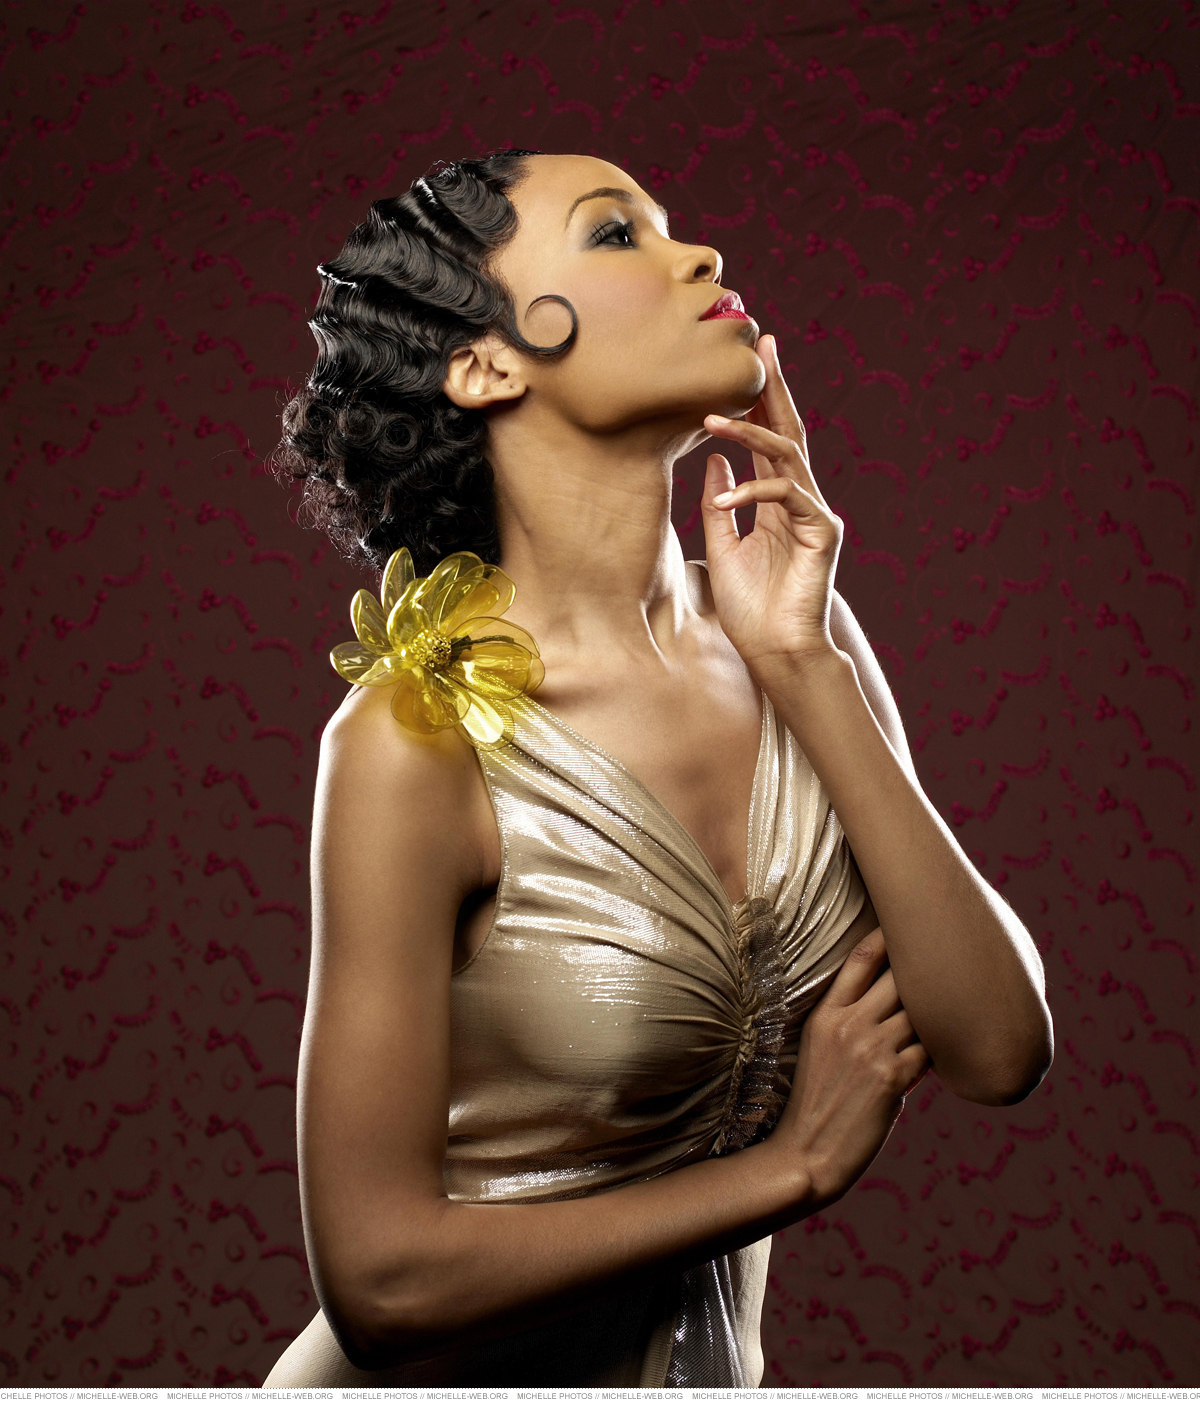 Michelle michelle williams singer photo 5839824 fanpop